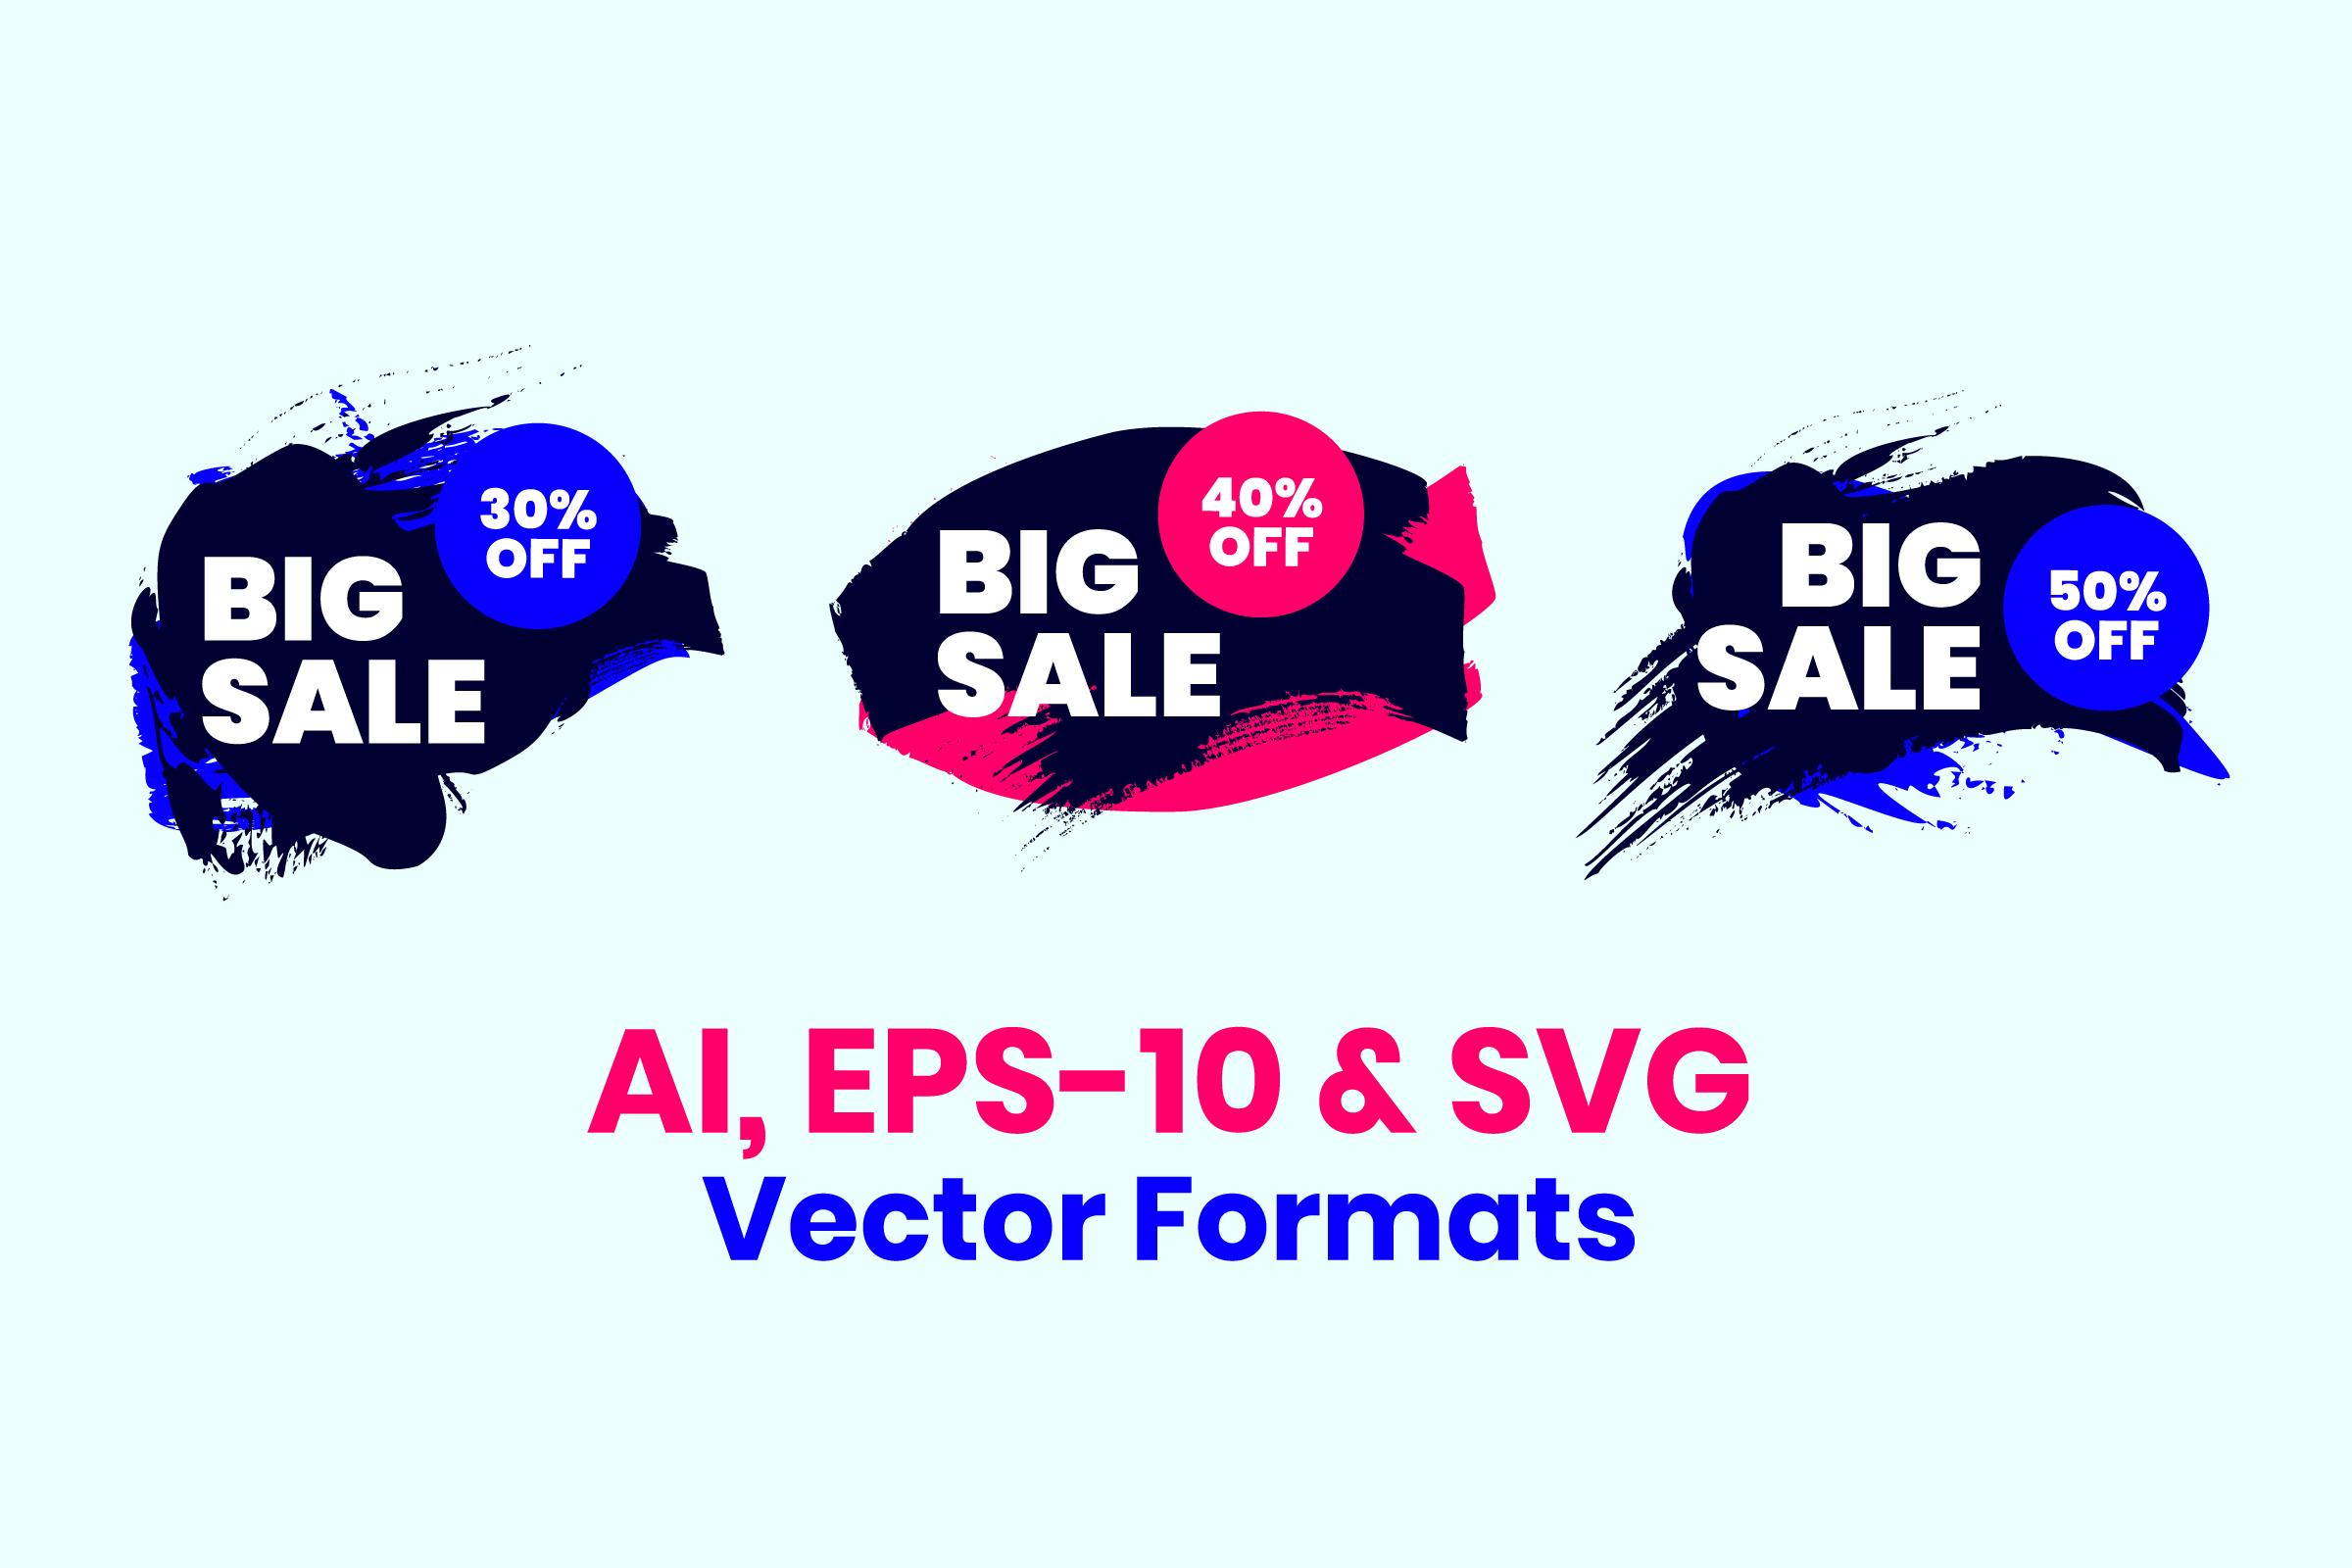 Modern Grunge Sale Price Marketing Graphics example image 4